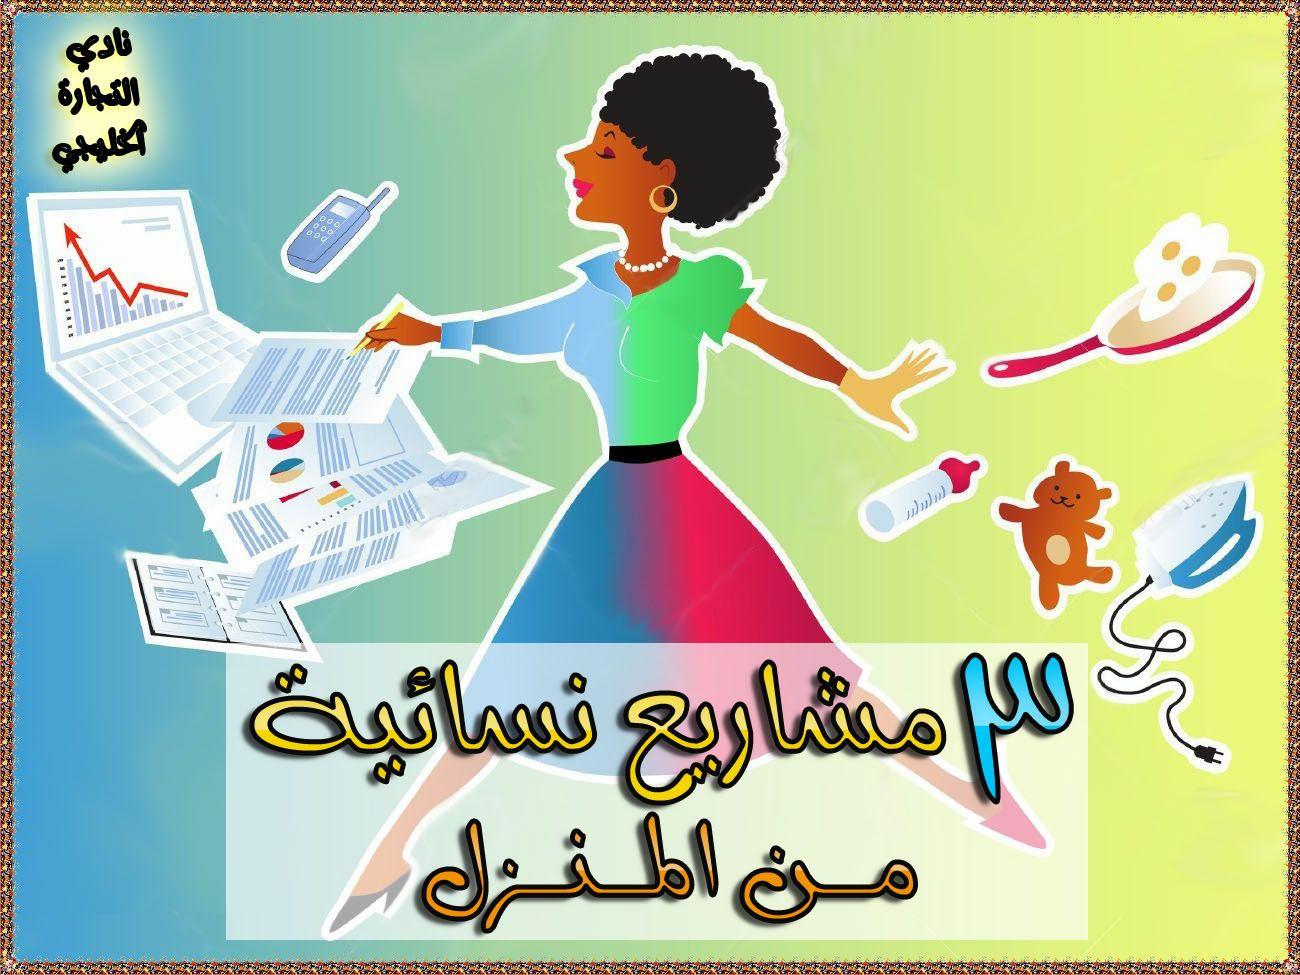 مشاريع نسائية من المنزل 3 مشاريع نسائية من المنزل في السعودية Disney Characters Character Fictional Characters